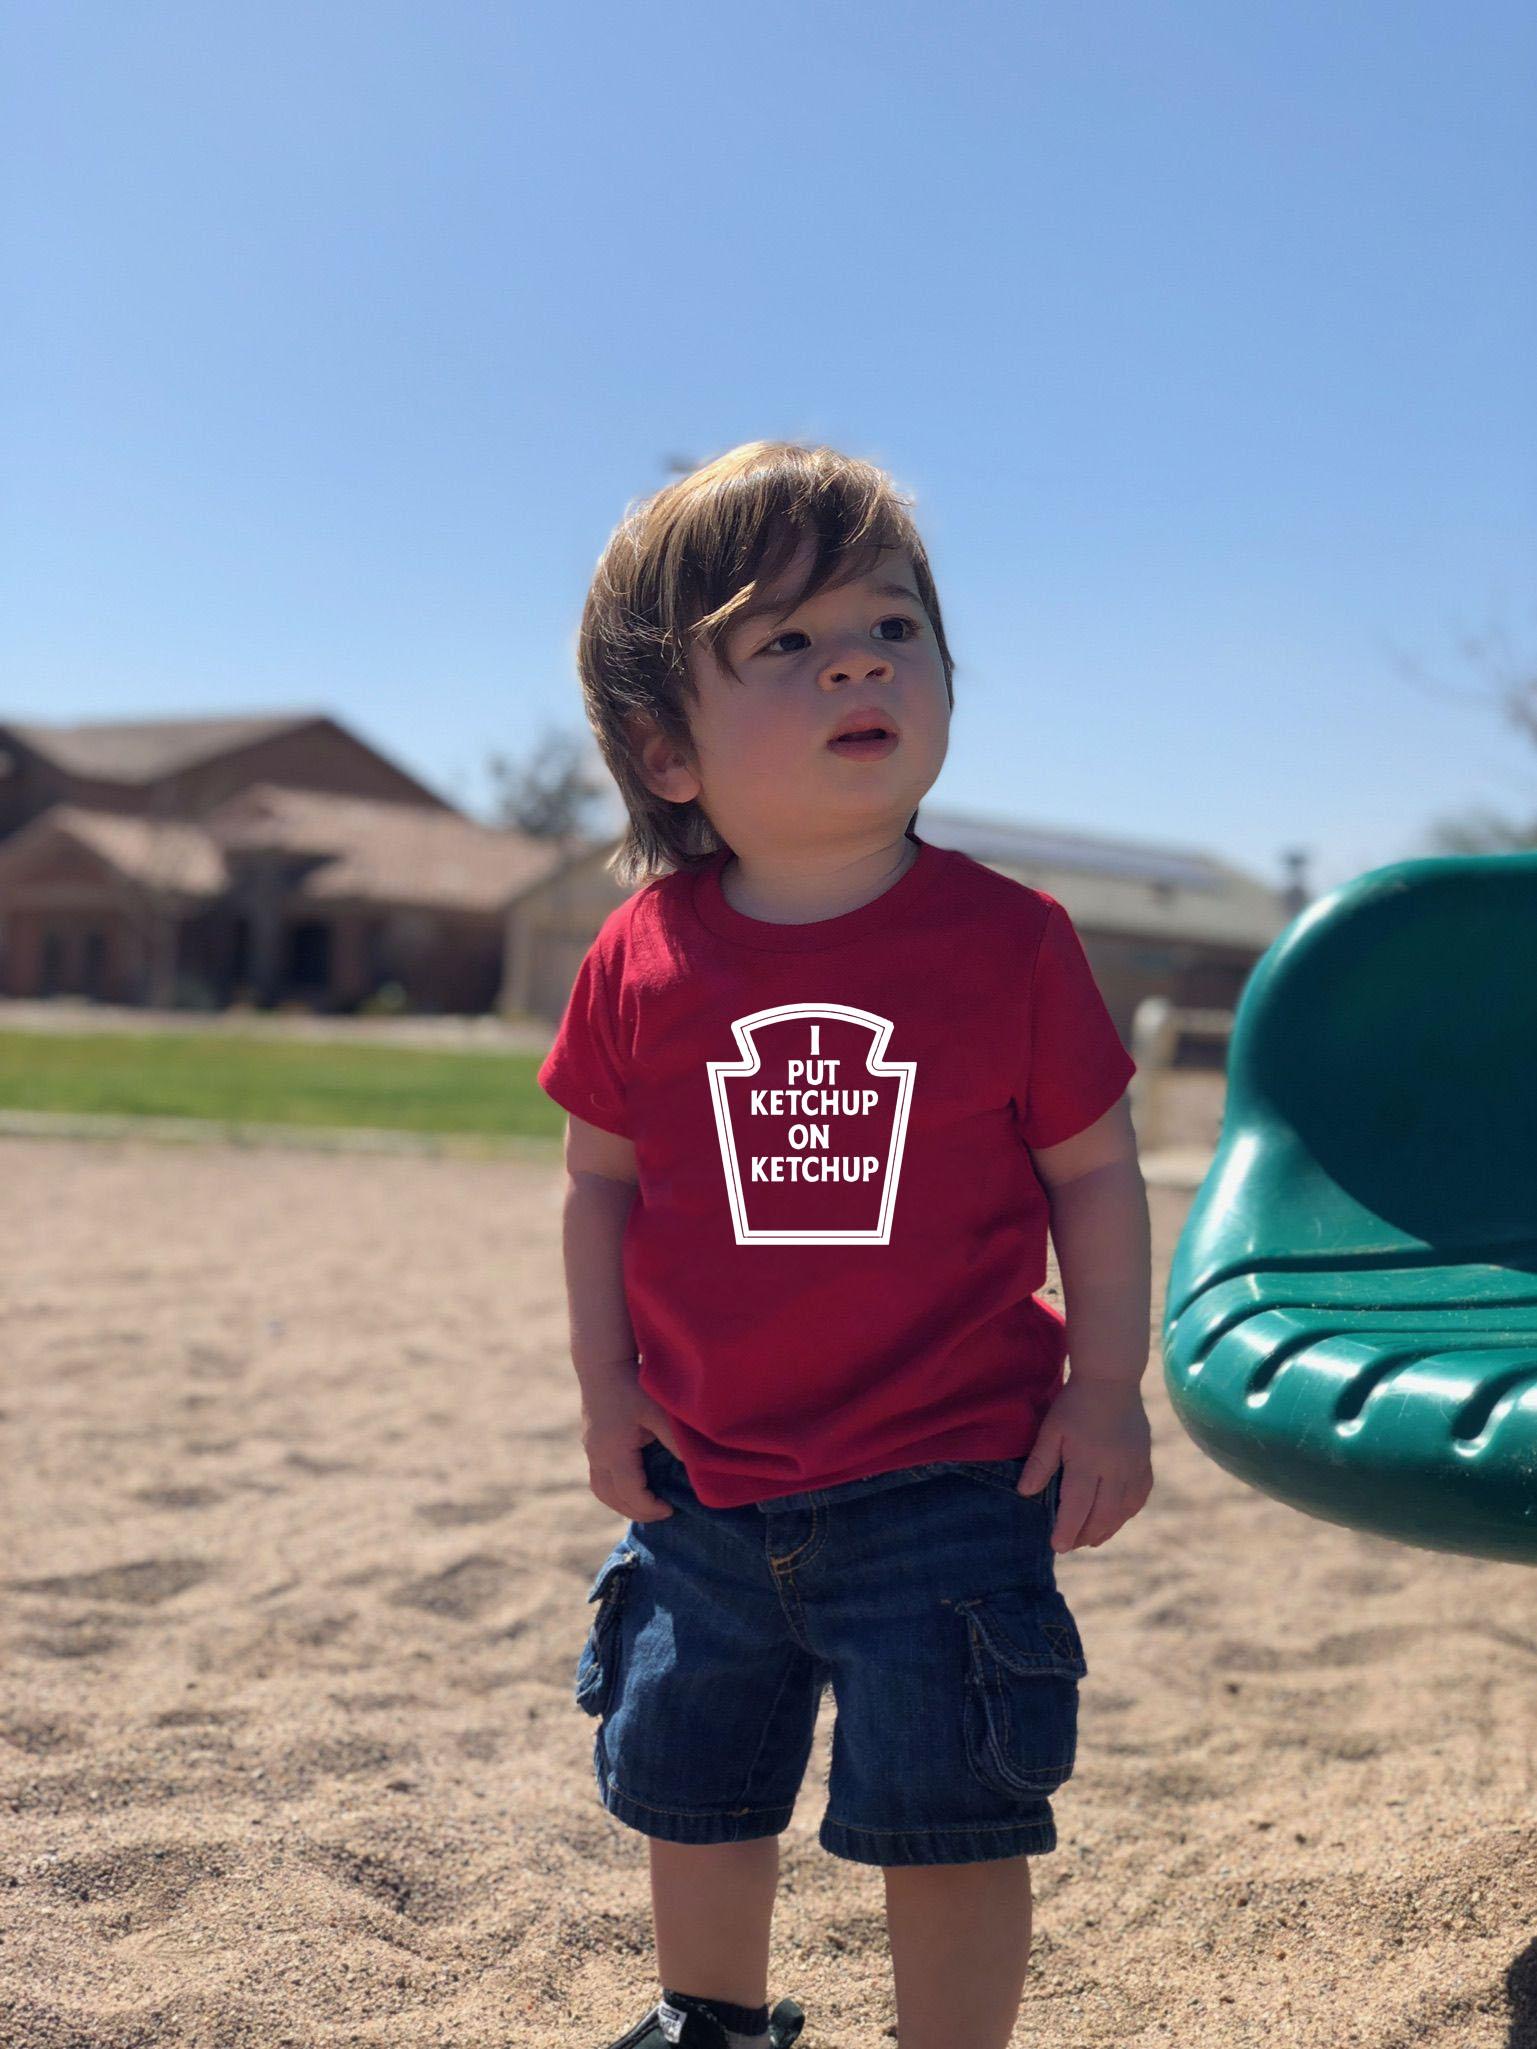 I Put Ketchup On My Ketchup children/'s tee kid/'s t-shirt funny shirt